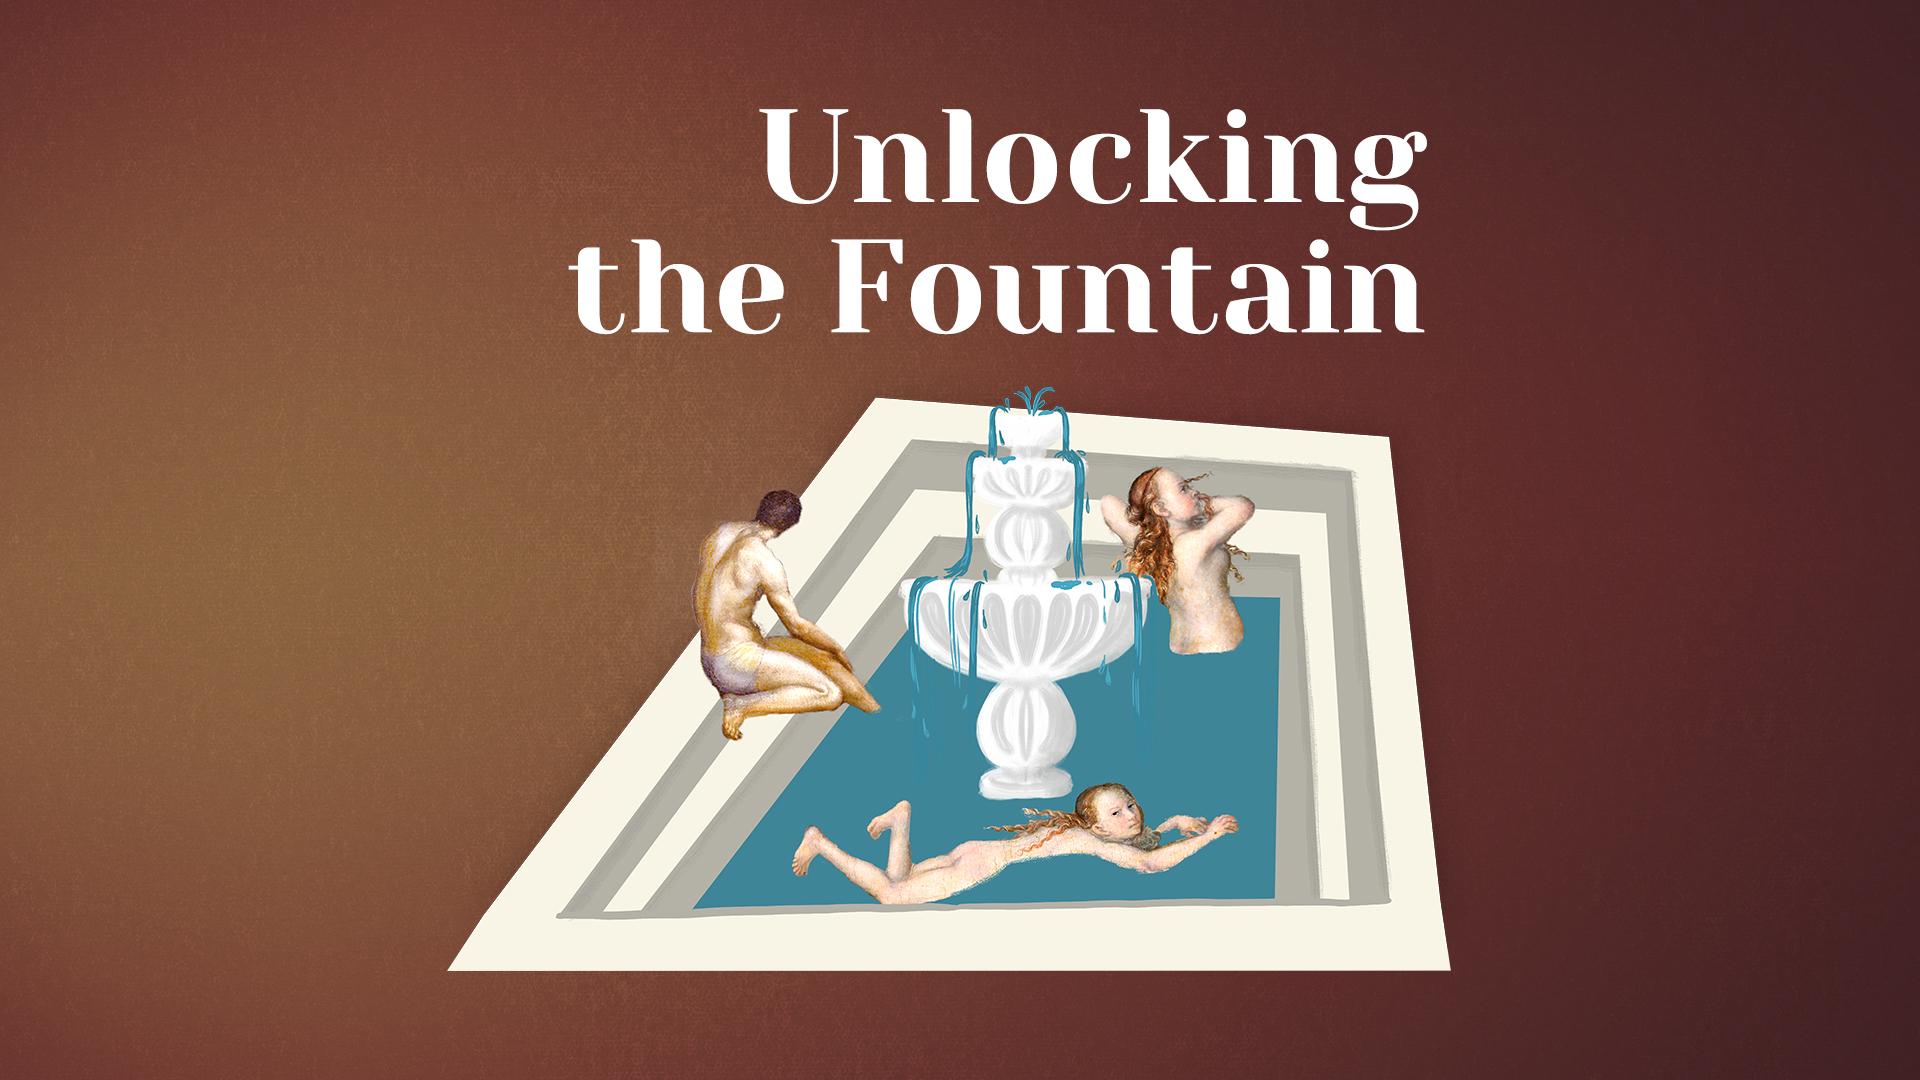 Unlocking: The Fountain